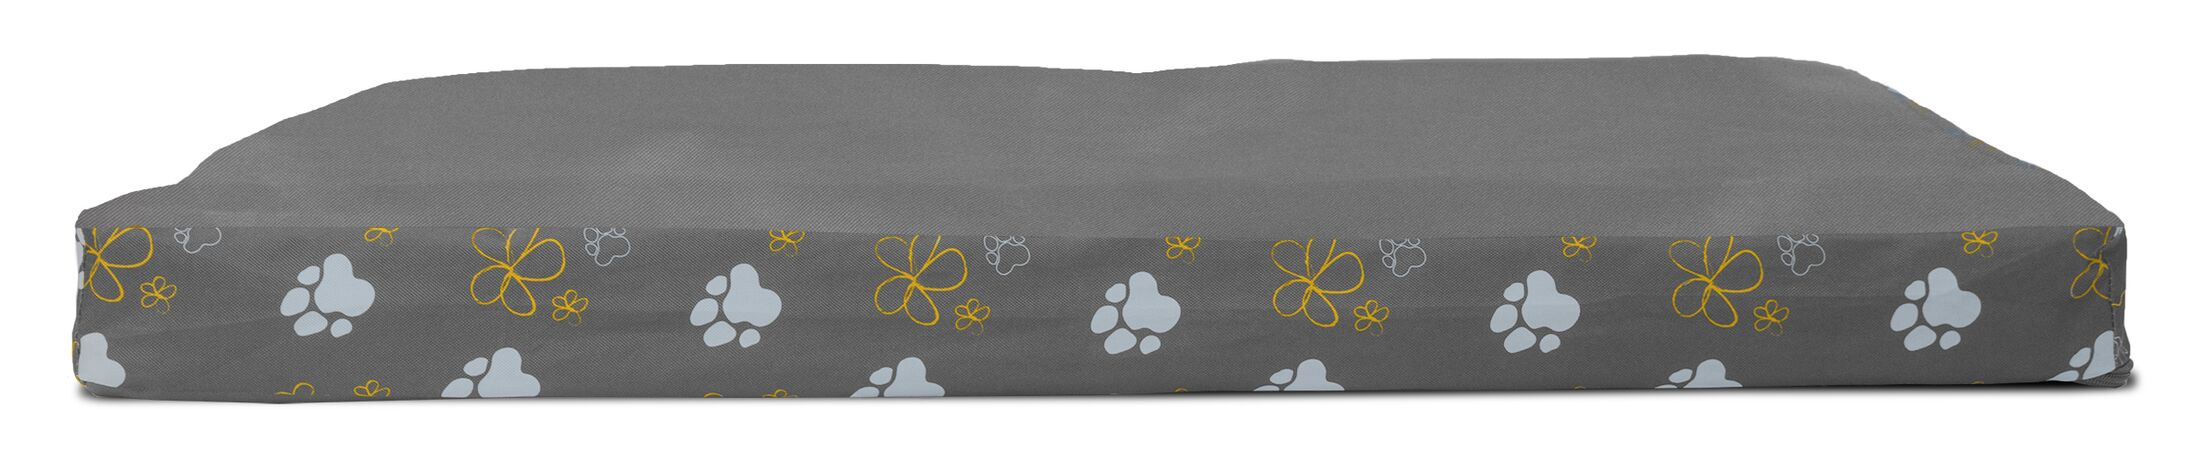 Garden Indoor/Outdoor Maston Cooling Gel Top Dog Pad Color: Iron Gray